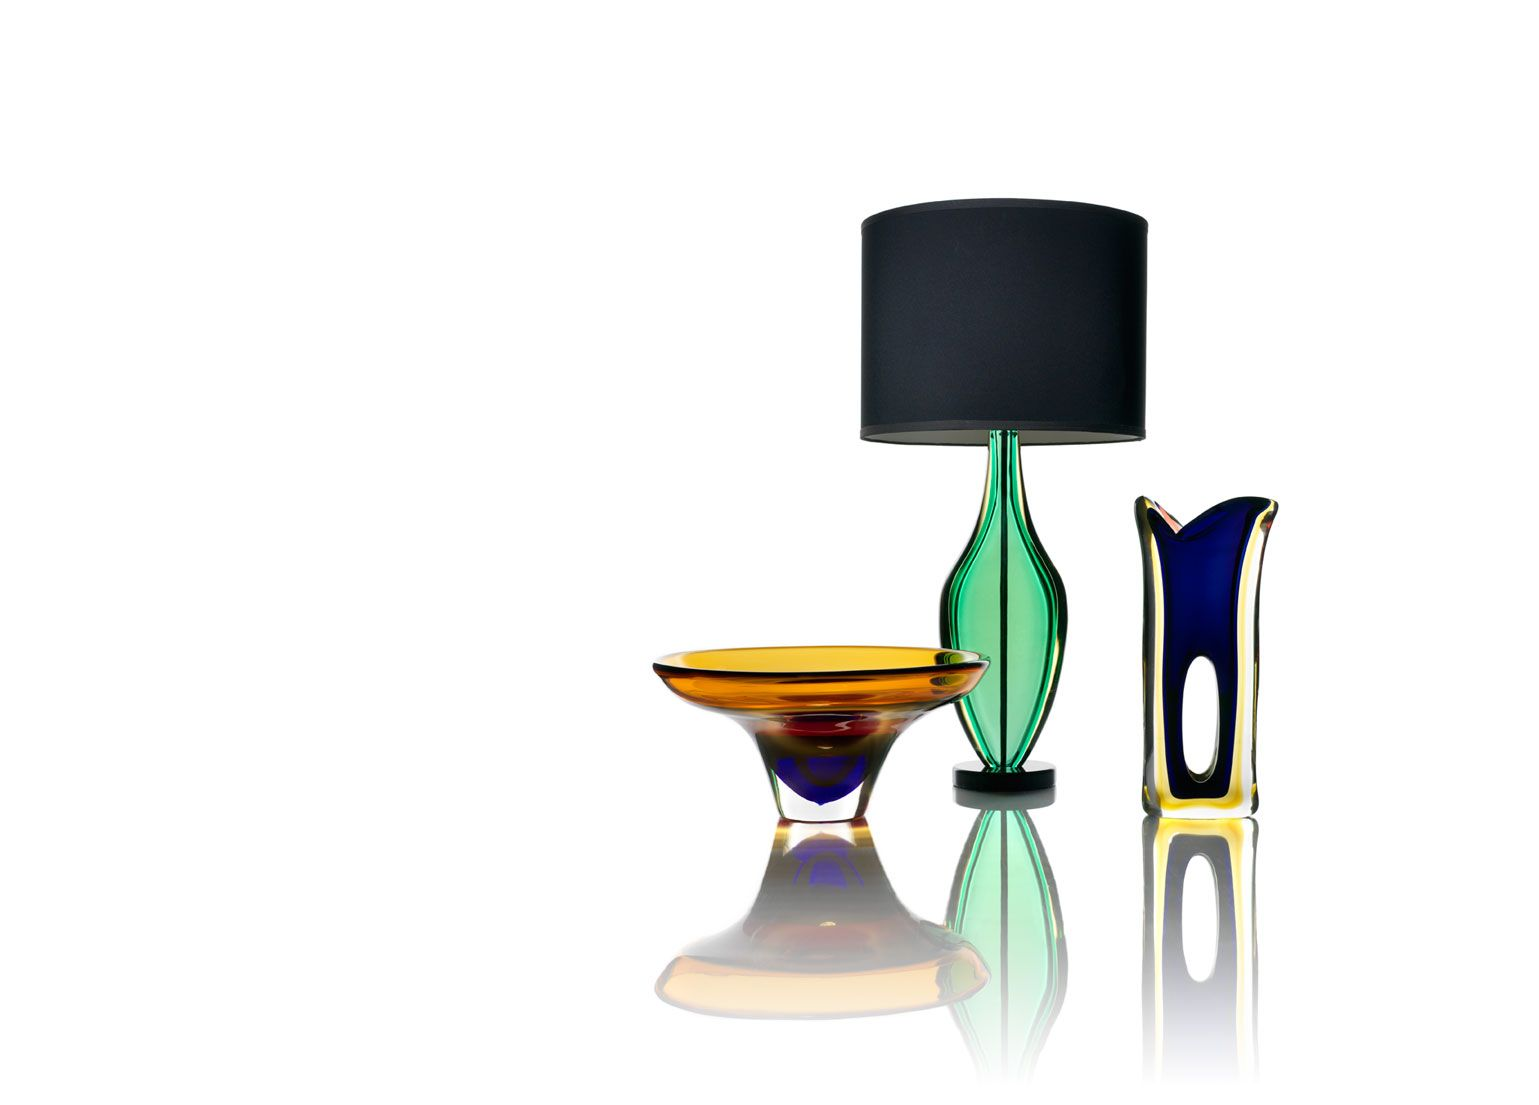 Circa Vintage Art Glass Calgary, AB | vintage decor | Pinterest ...